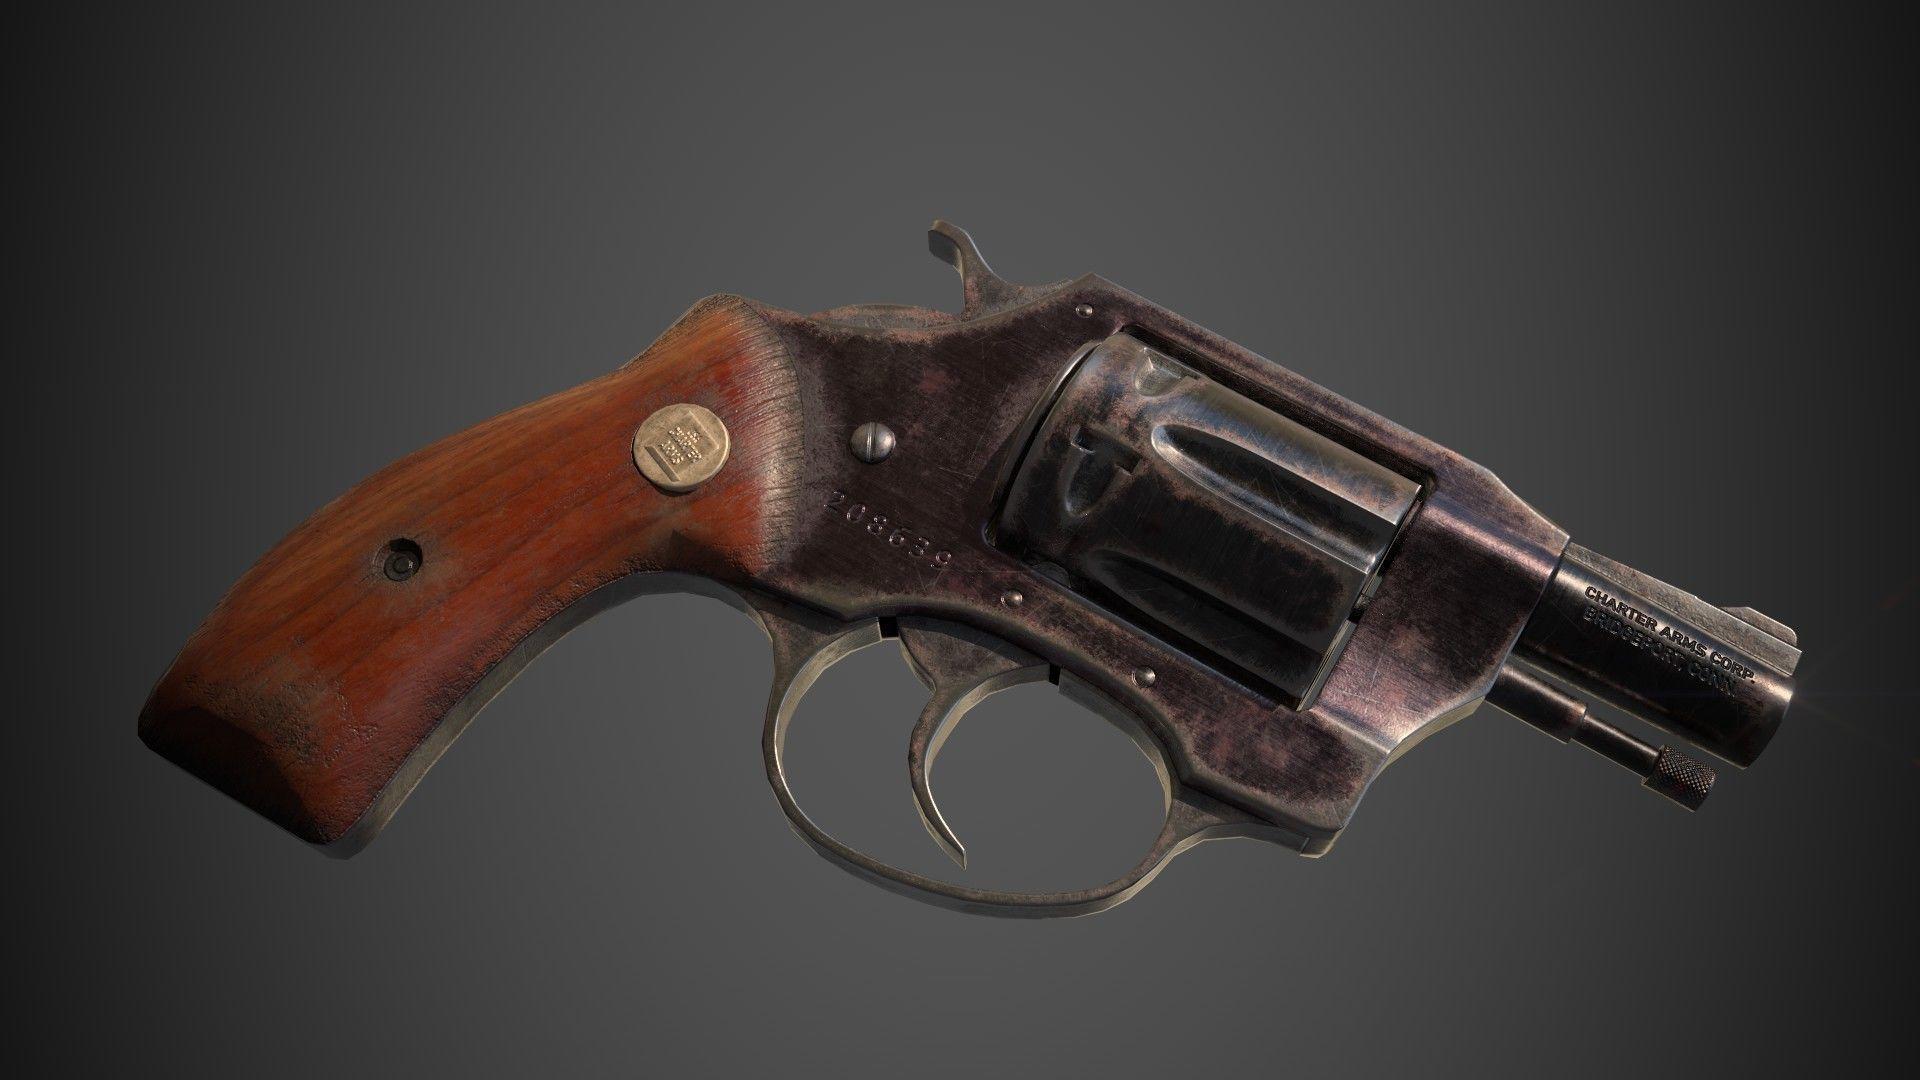 Charter Arms Undercoverette 32 Revolver